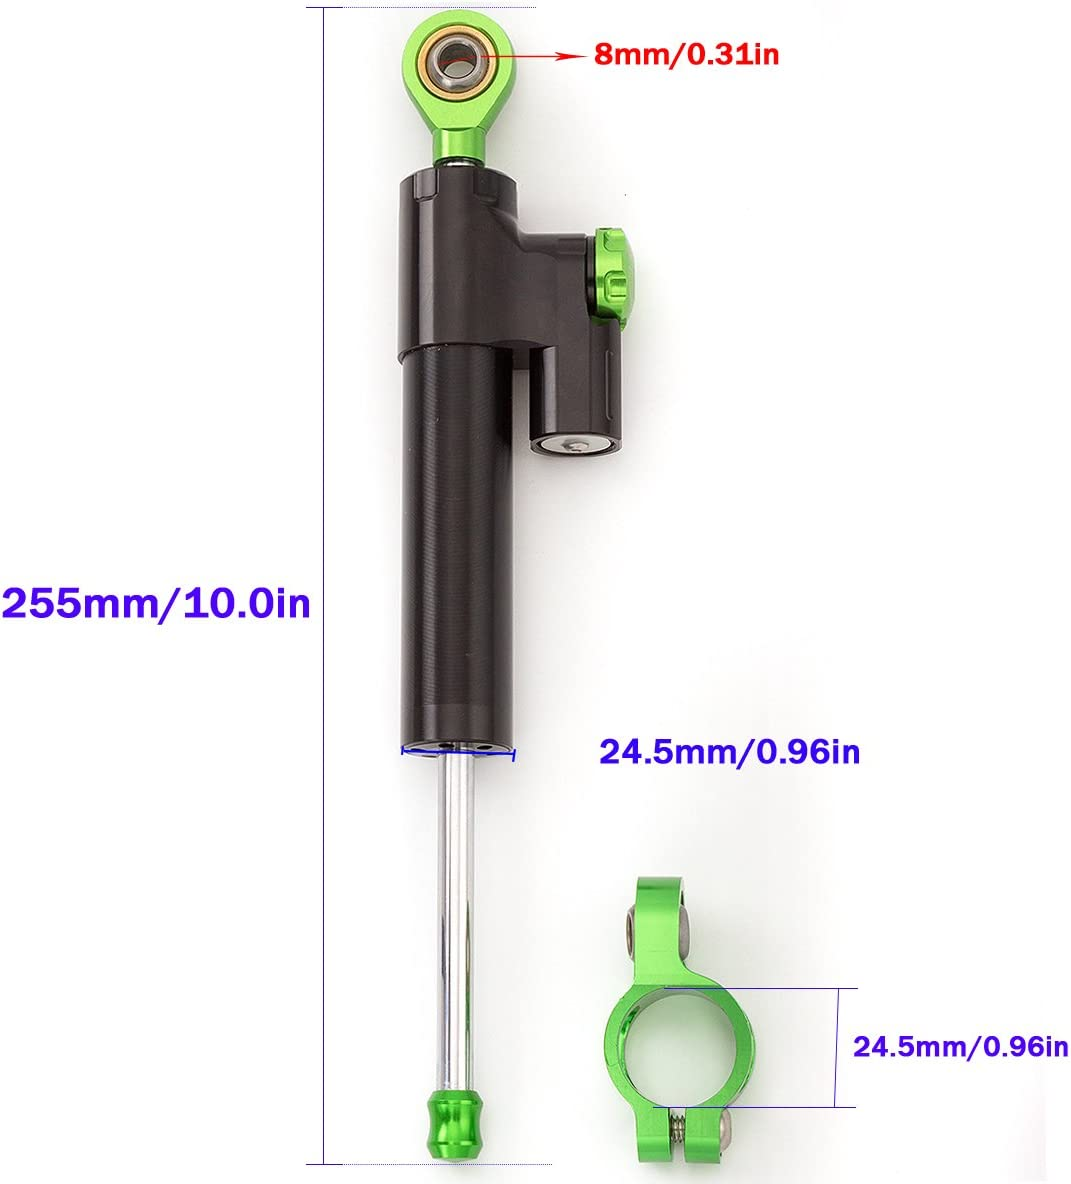 Z1000 03-16 EX300 NINJA300 2013-2016 Motorcycle Adjustable Universal Steering Damper Stabilizer Control For Kawasaki ZX6R 2005-2017 NINJA 250R EX250 2008-2012 ZZR1400 ZX14 06-12 ZX10R 04-05